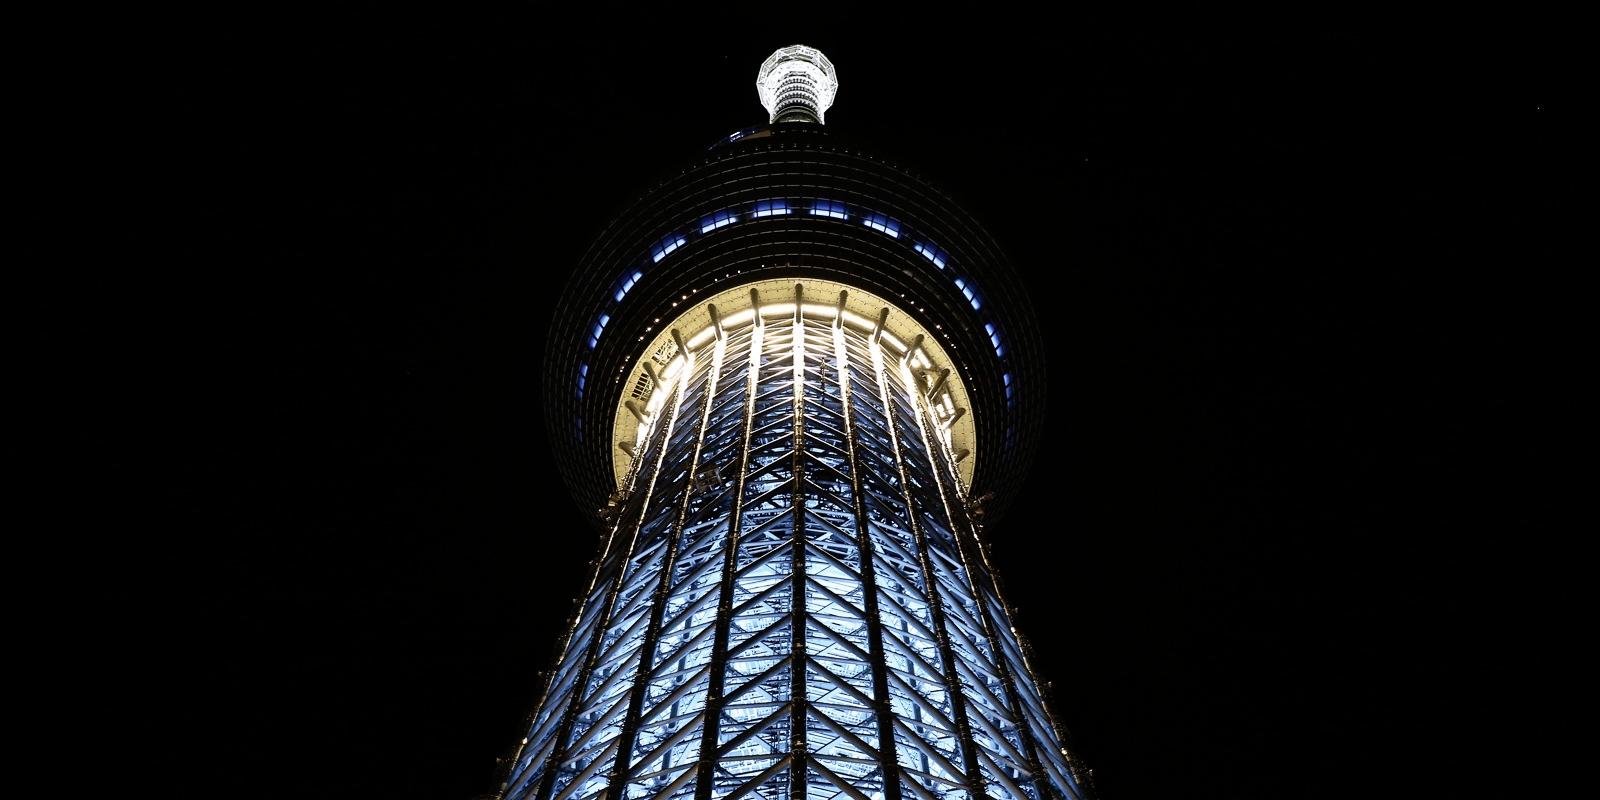 neofuturistic tokyo skytree fli - salz   ello